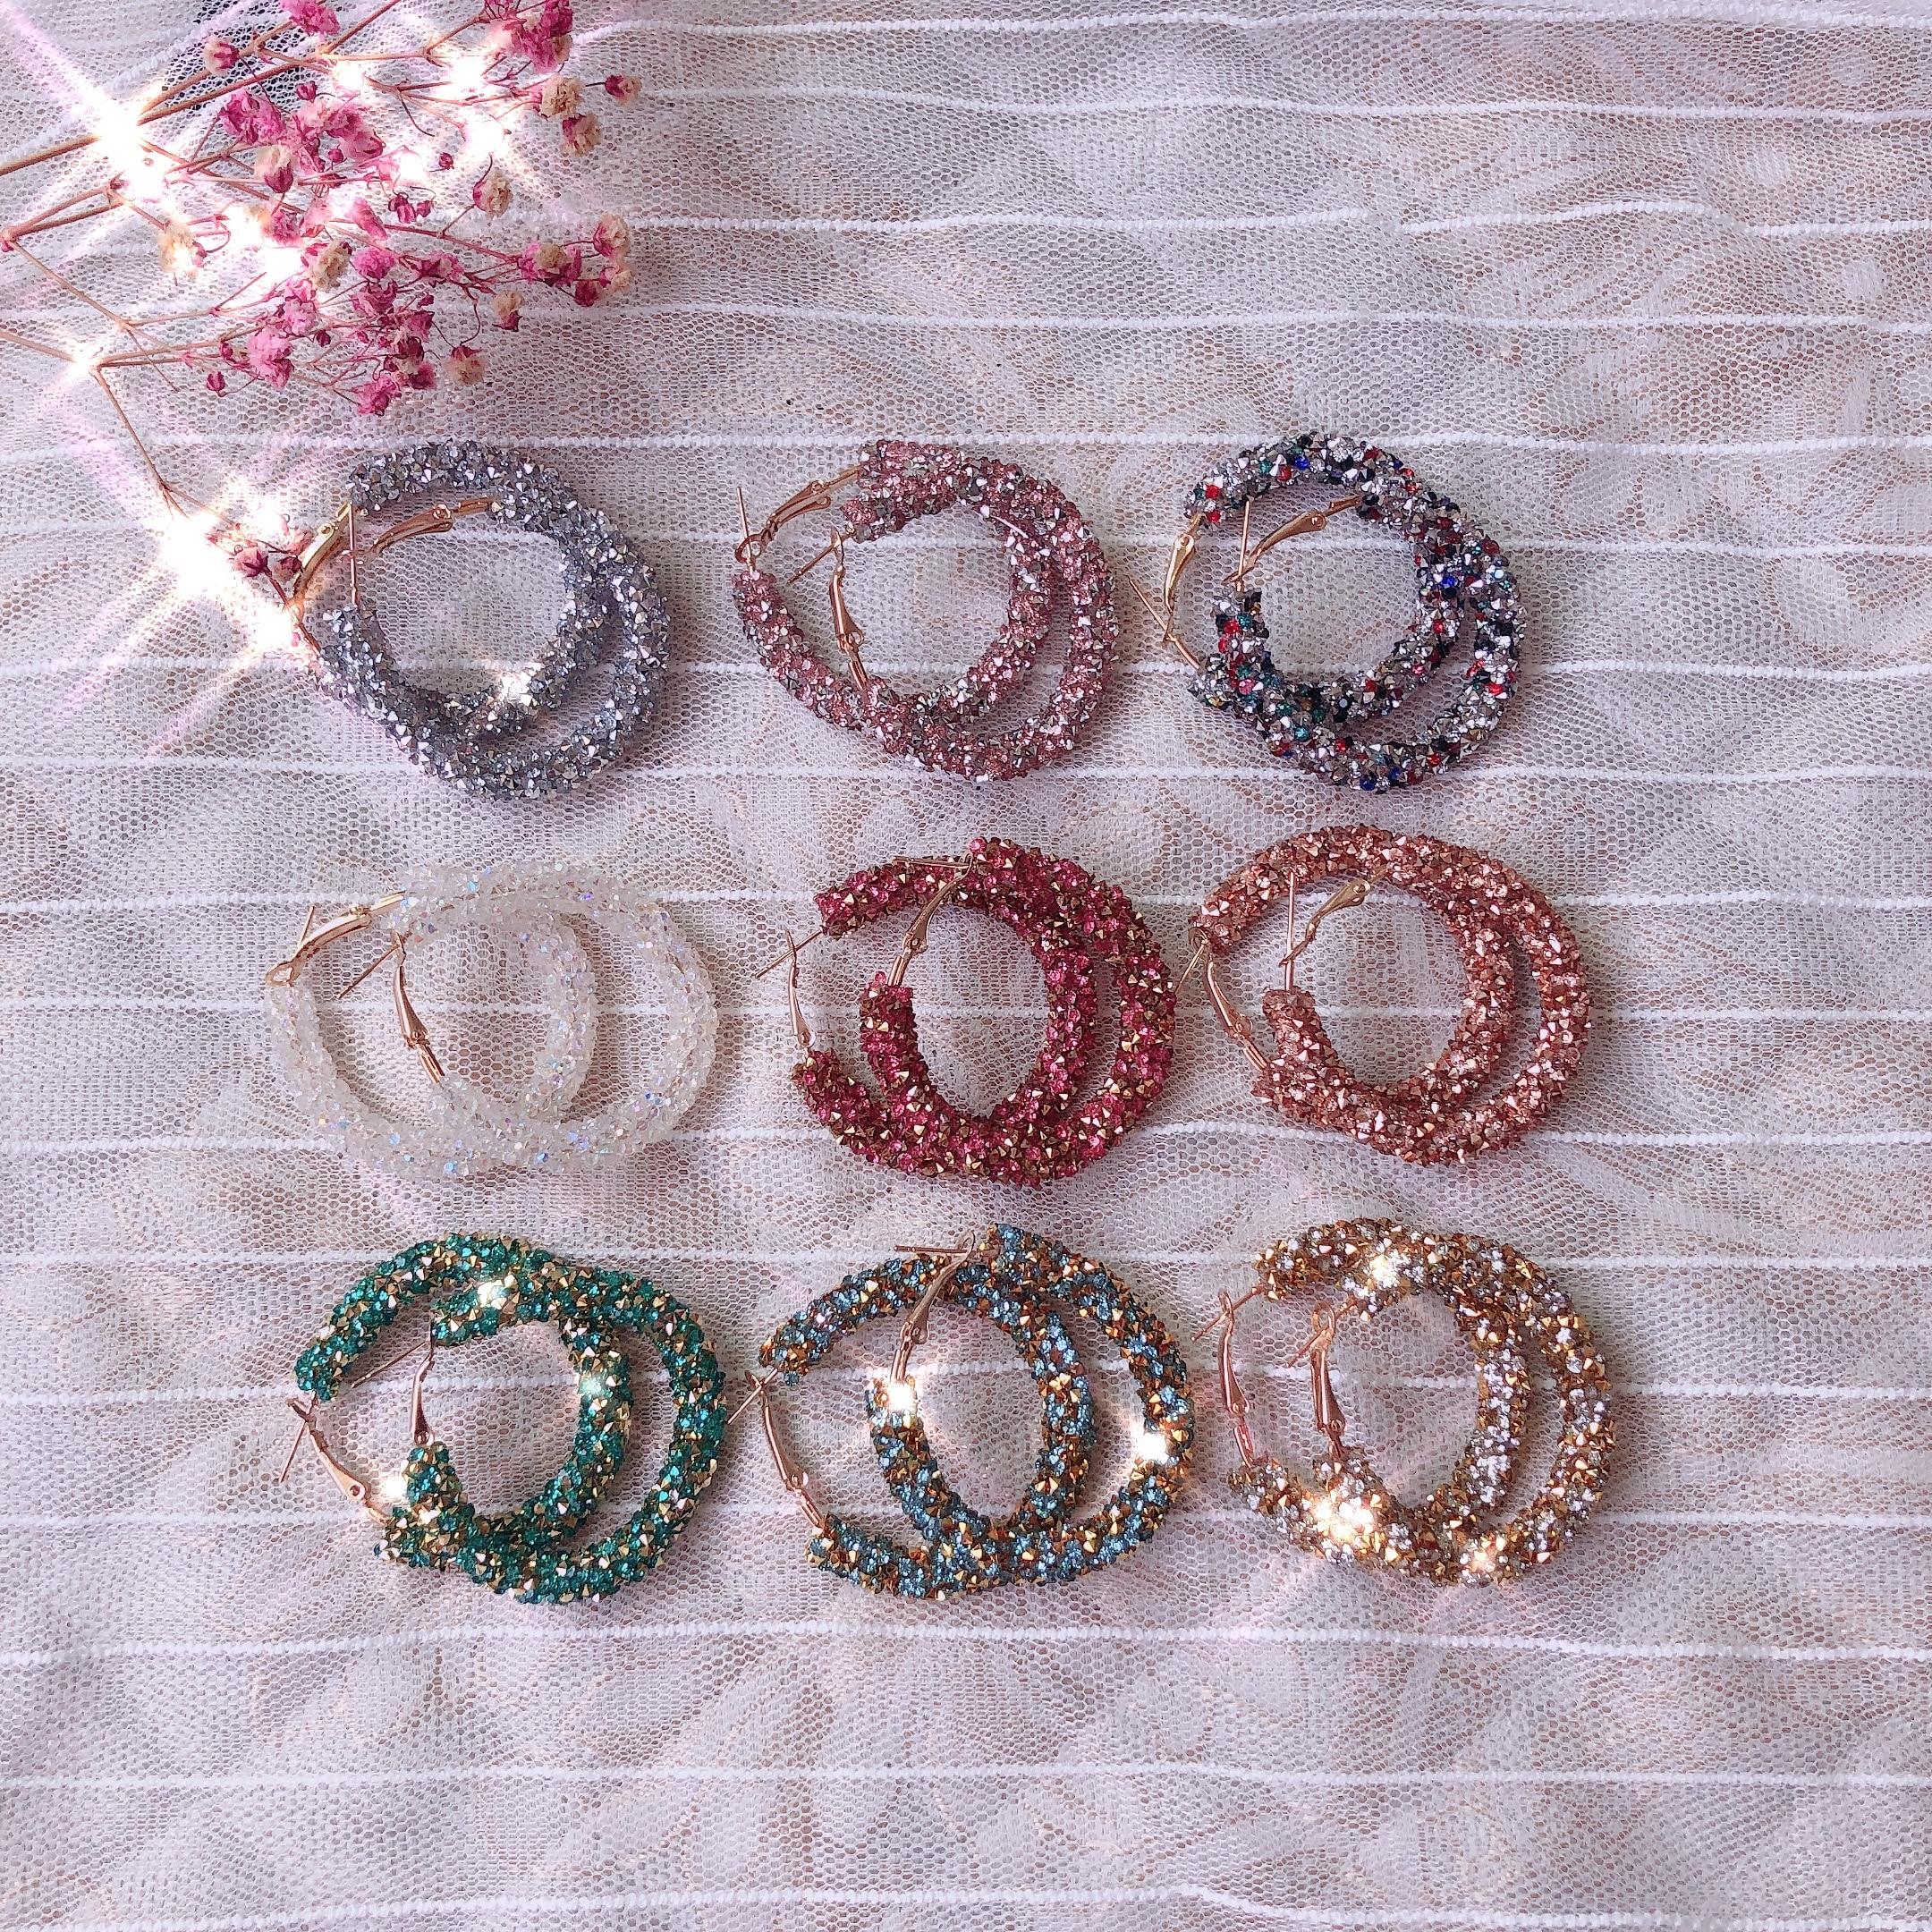 Women Simple New Design Fashion Charm Crystal Hoop Earrings Geometric Round Shiny Rhinestone Big Earring Jewelry